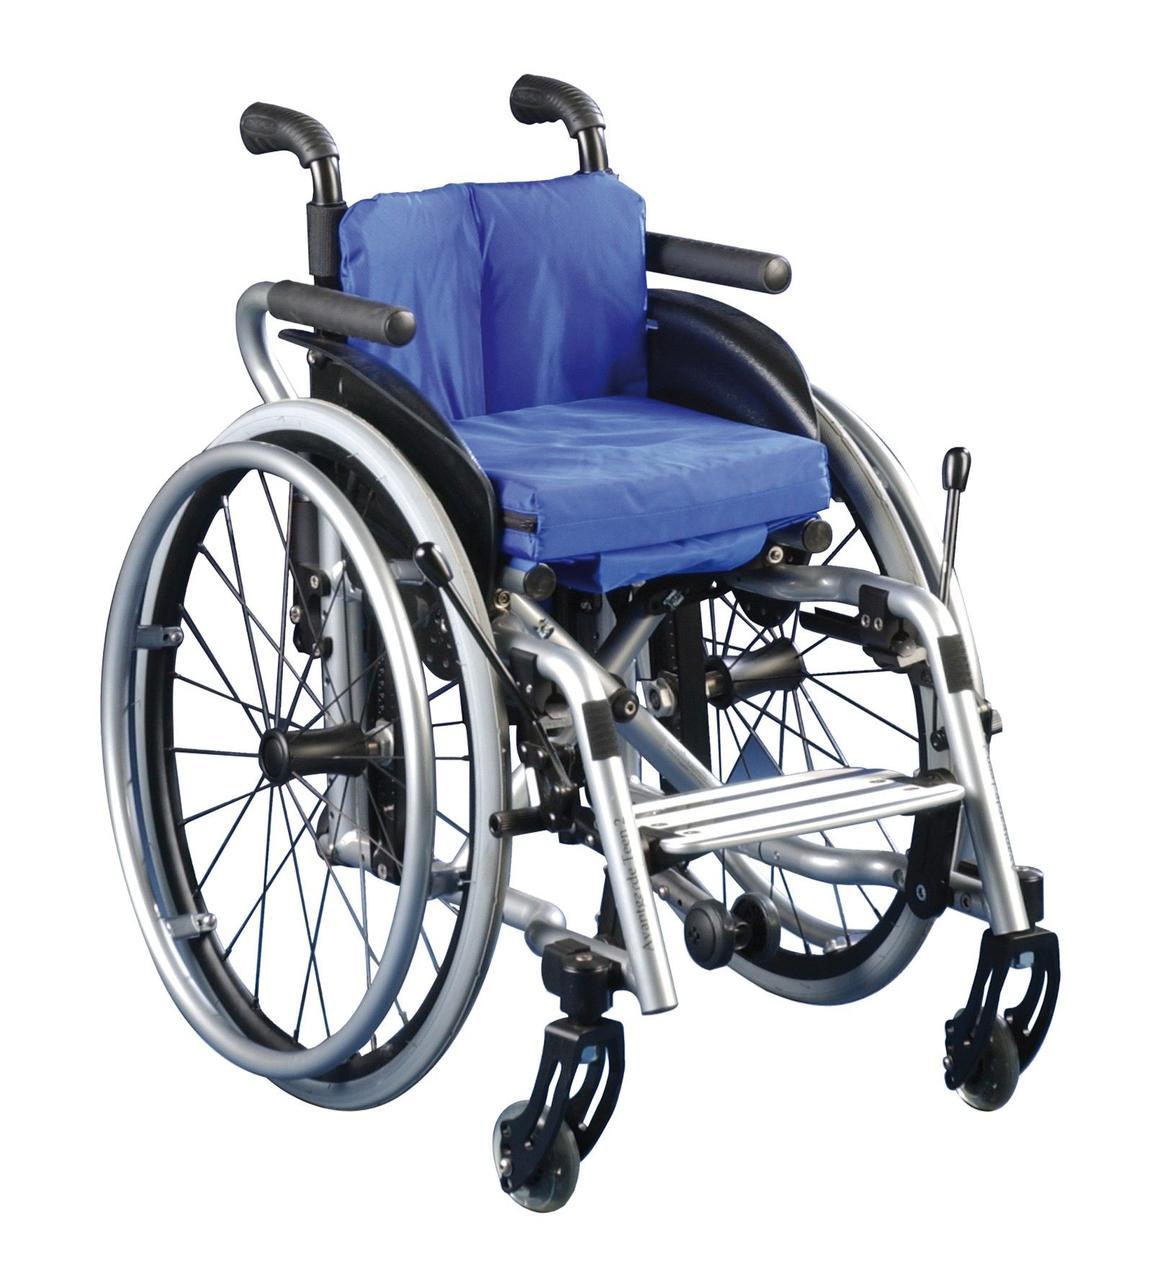 Кресло-коляска Otto Bock АВАНГАРД ТИН активного типа для детей и подростков - фото 5